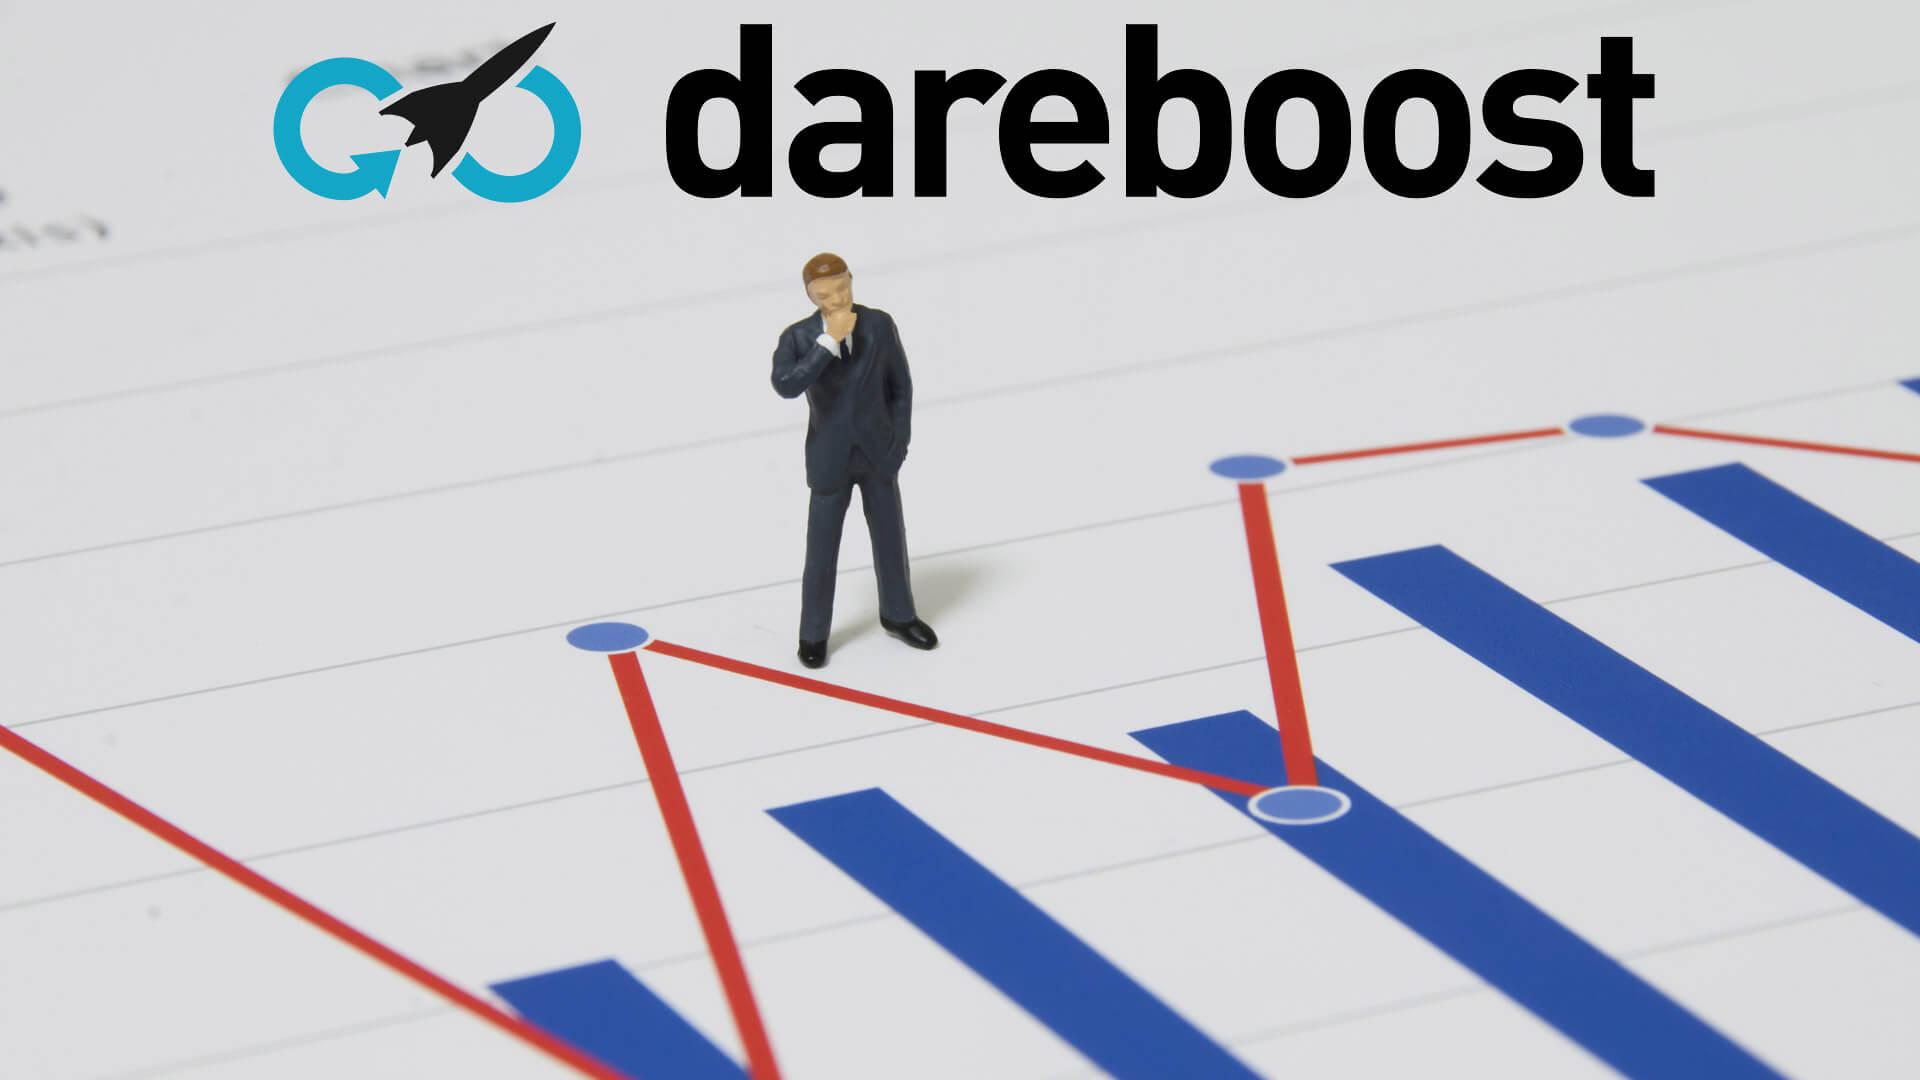 Dareboost améliore votre site web